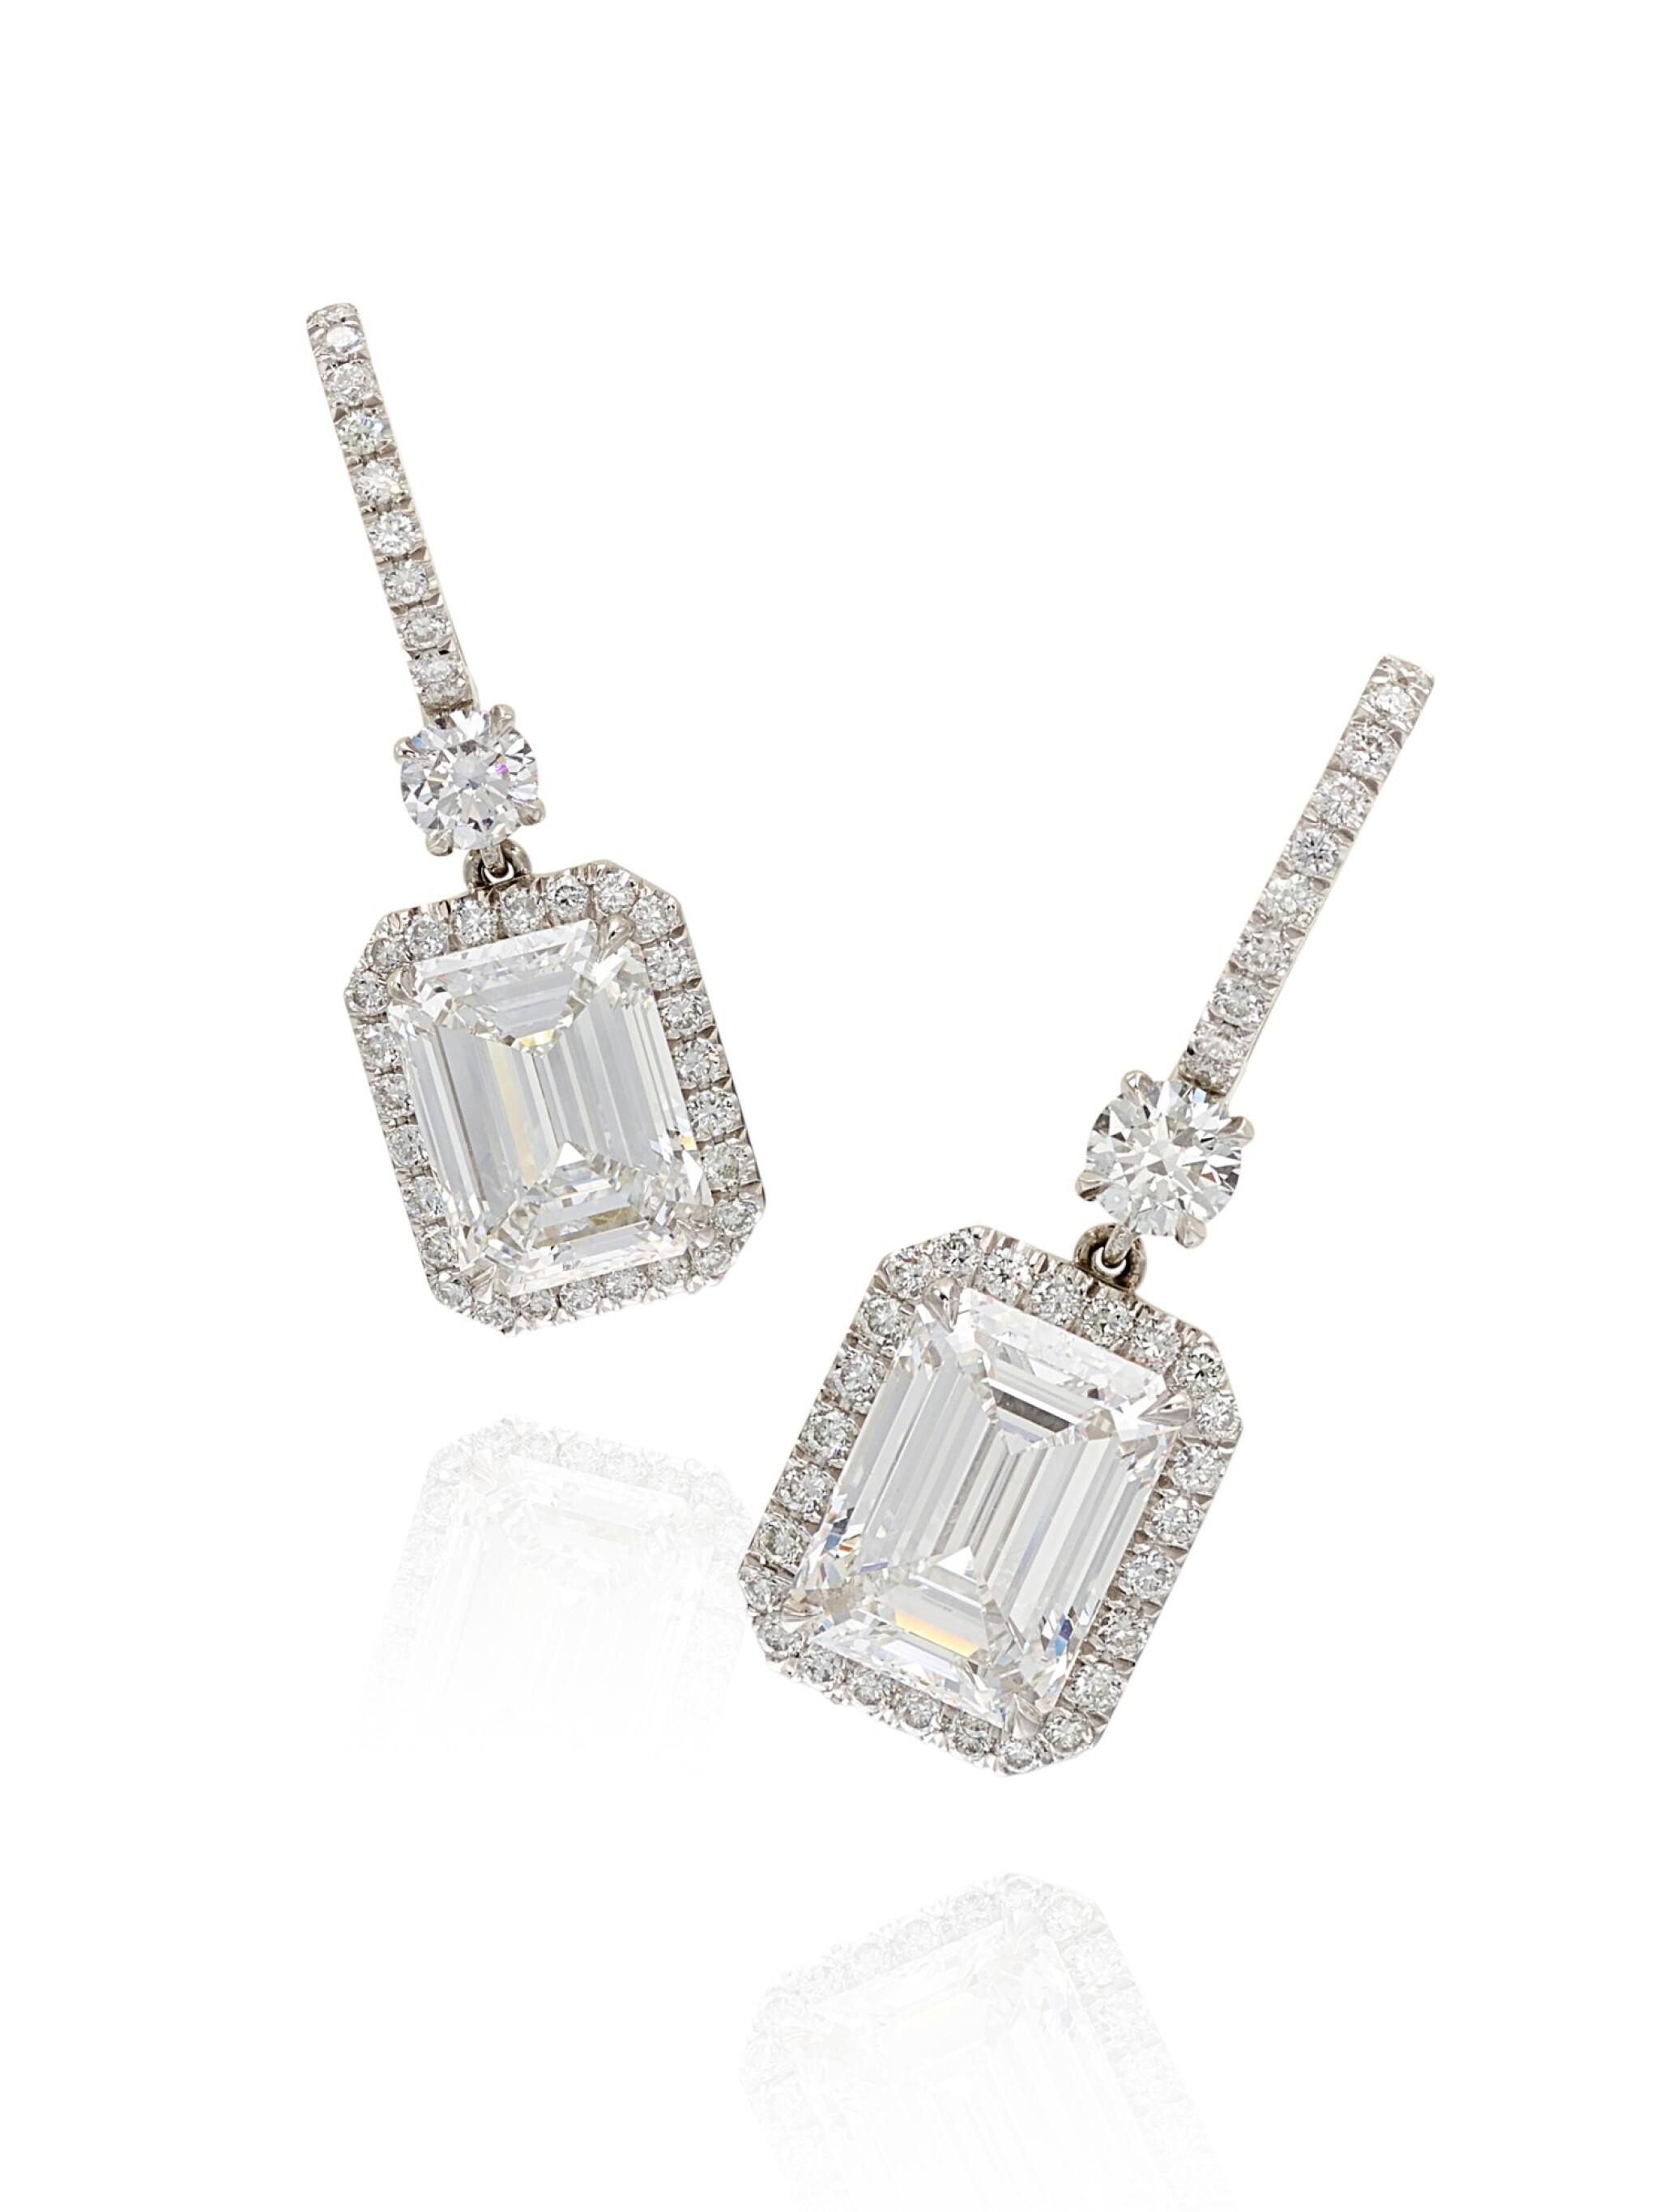 View full screen - View 1 of Lot 1688. Pair of Diamond Pendent Earrings | 3.01及3.01 方形 D色 內部無暇 鑽石 耳墜一對.